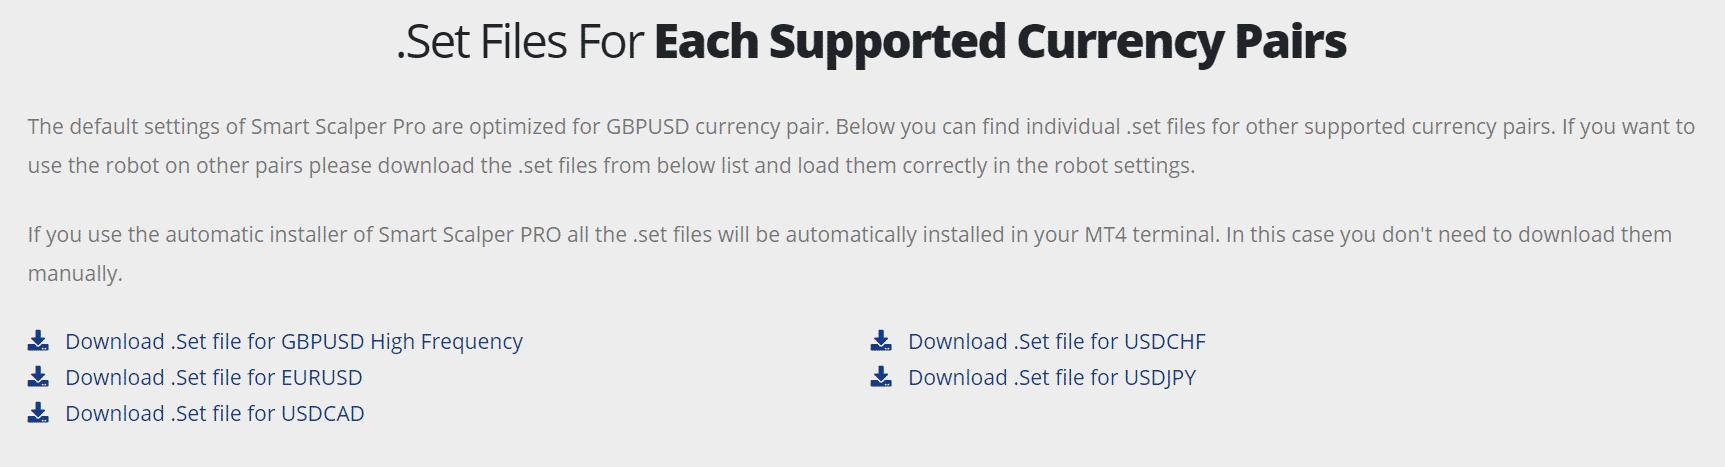 Smart Scalper Pro settings files